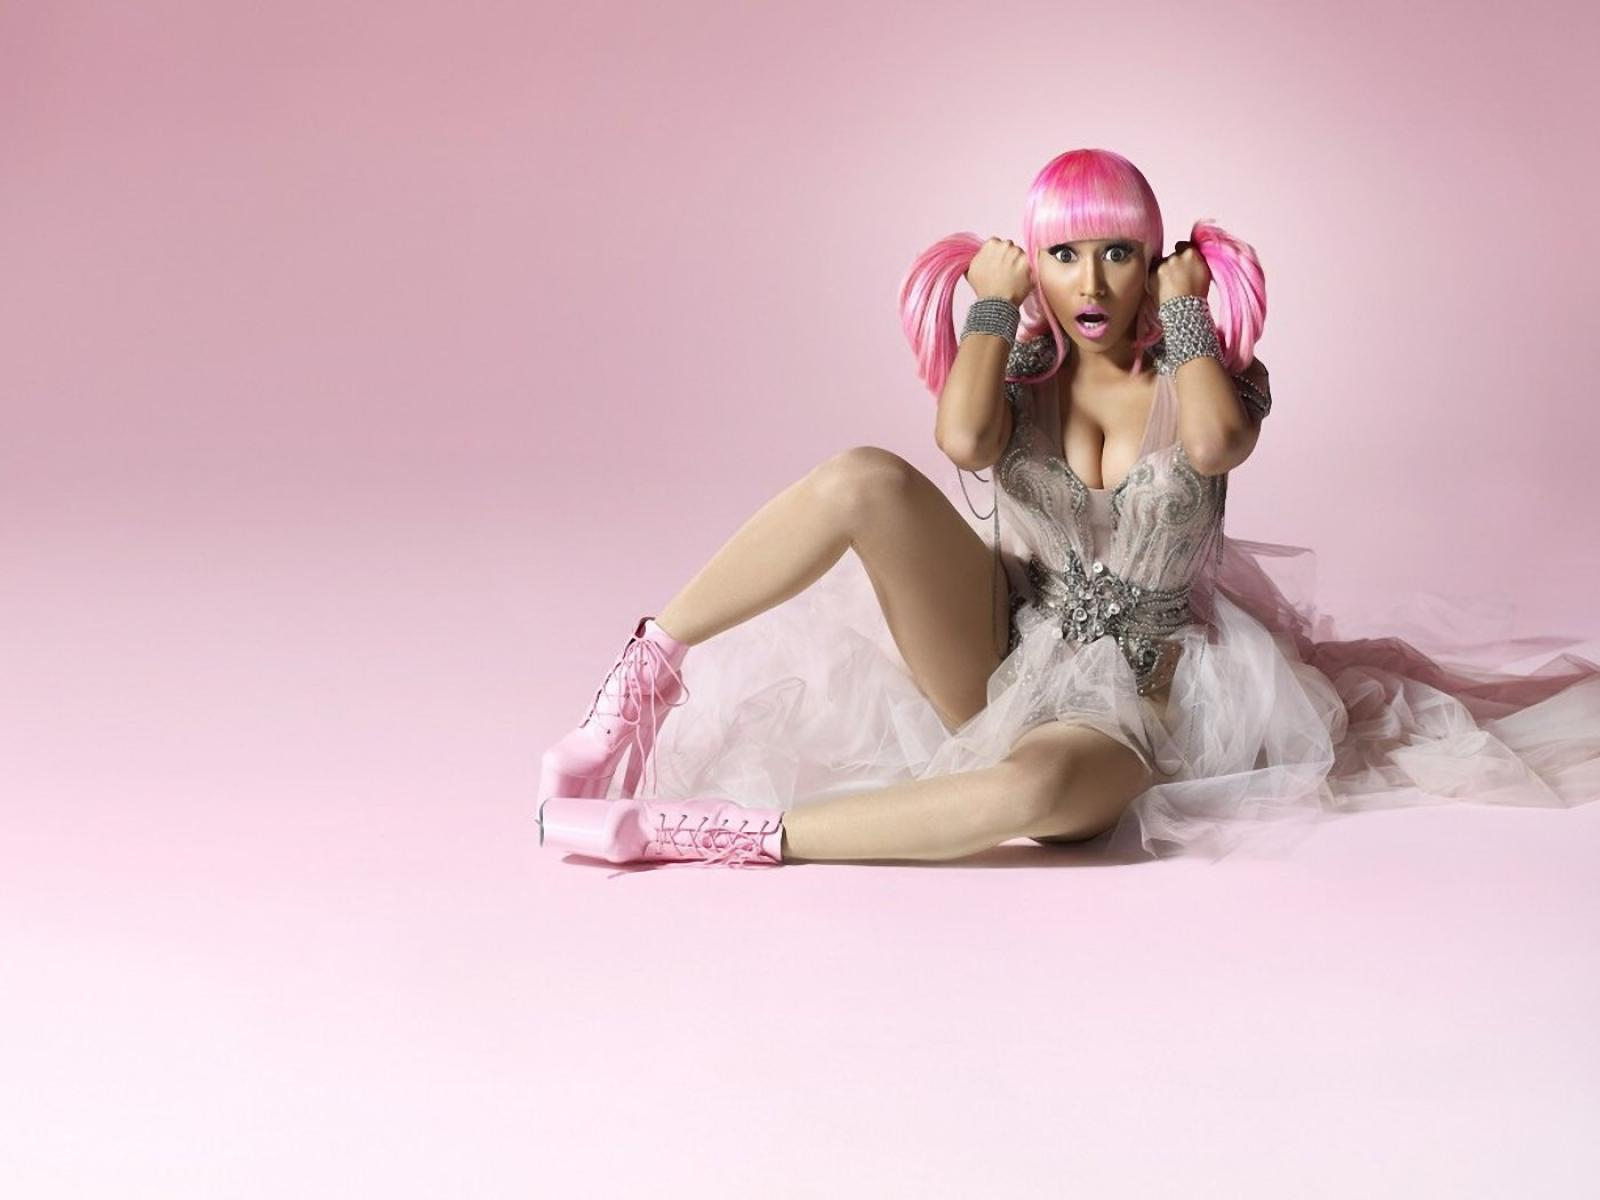 Nicki Minaj Pinktails Rap Wallpapers 1600x1200